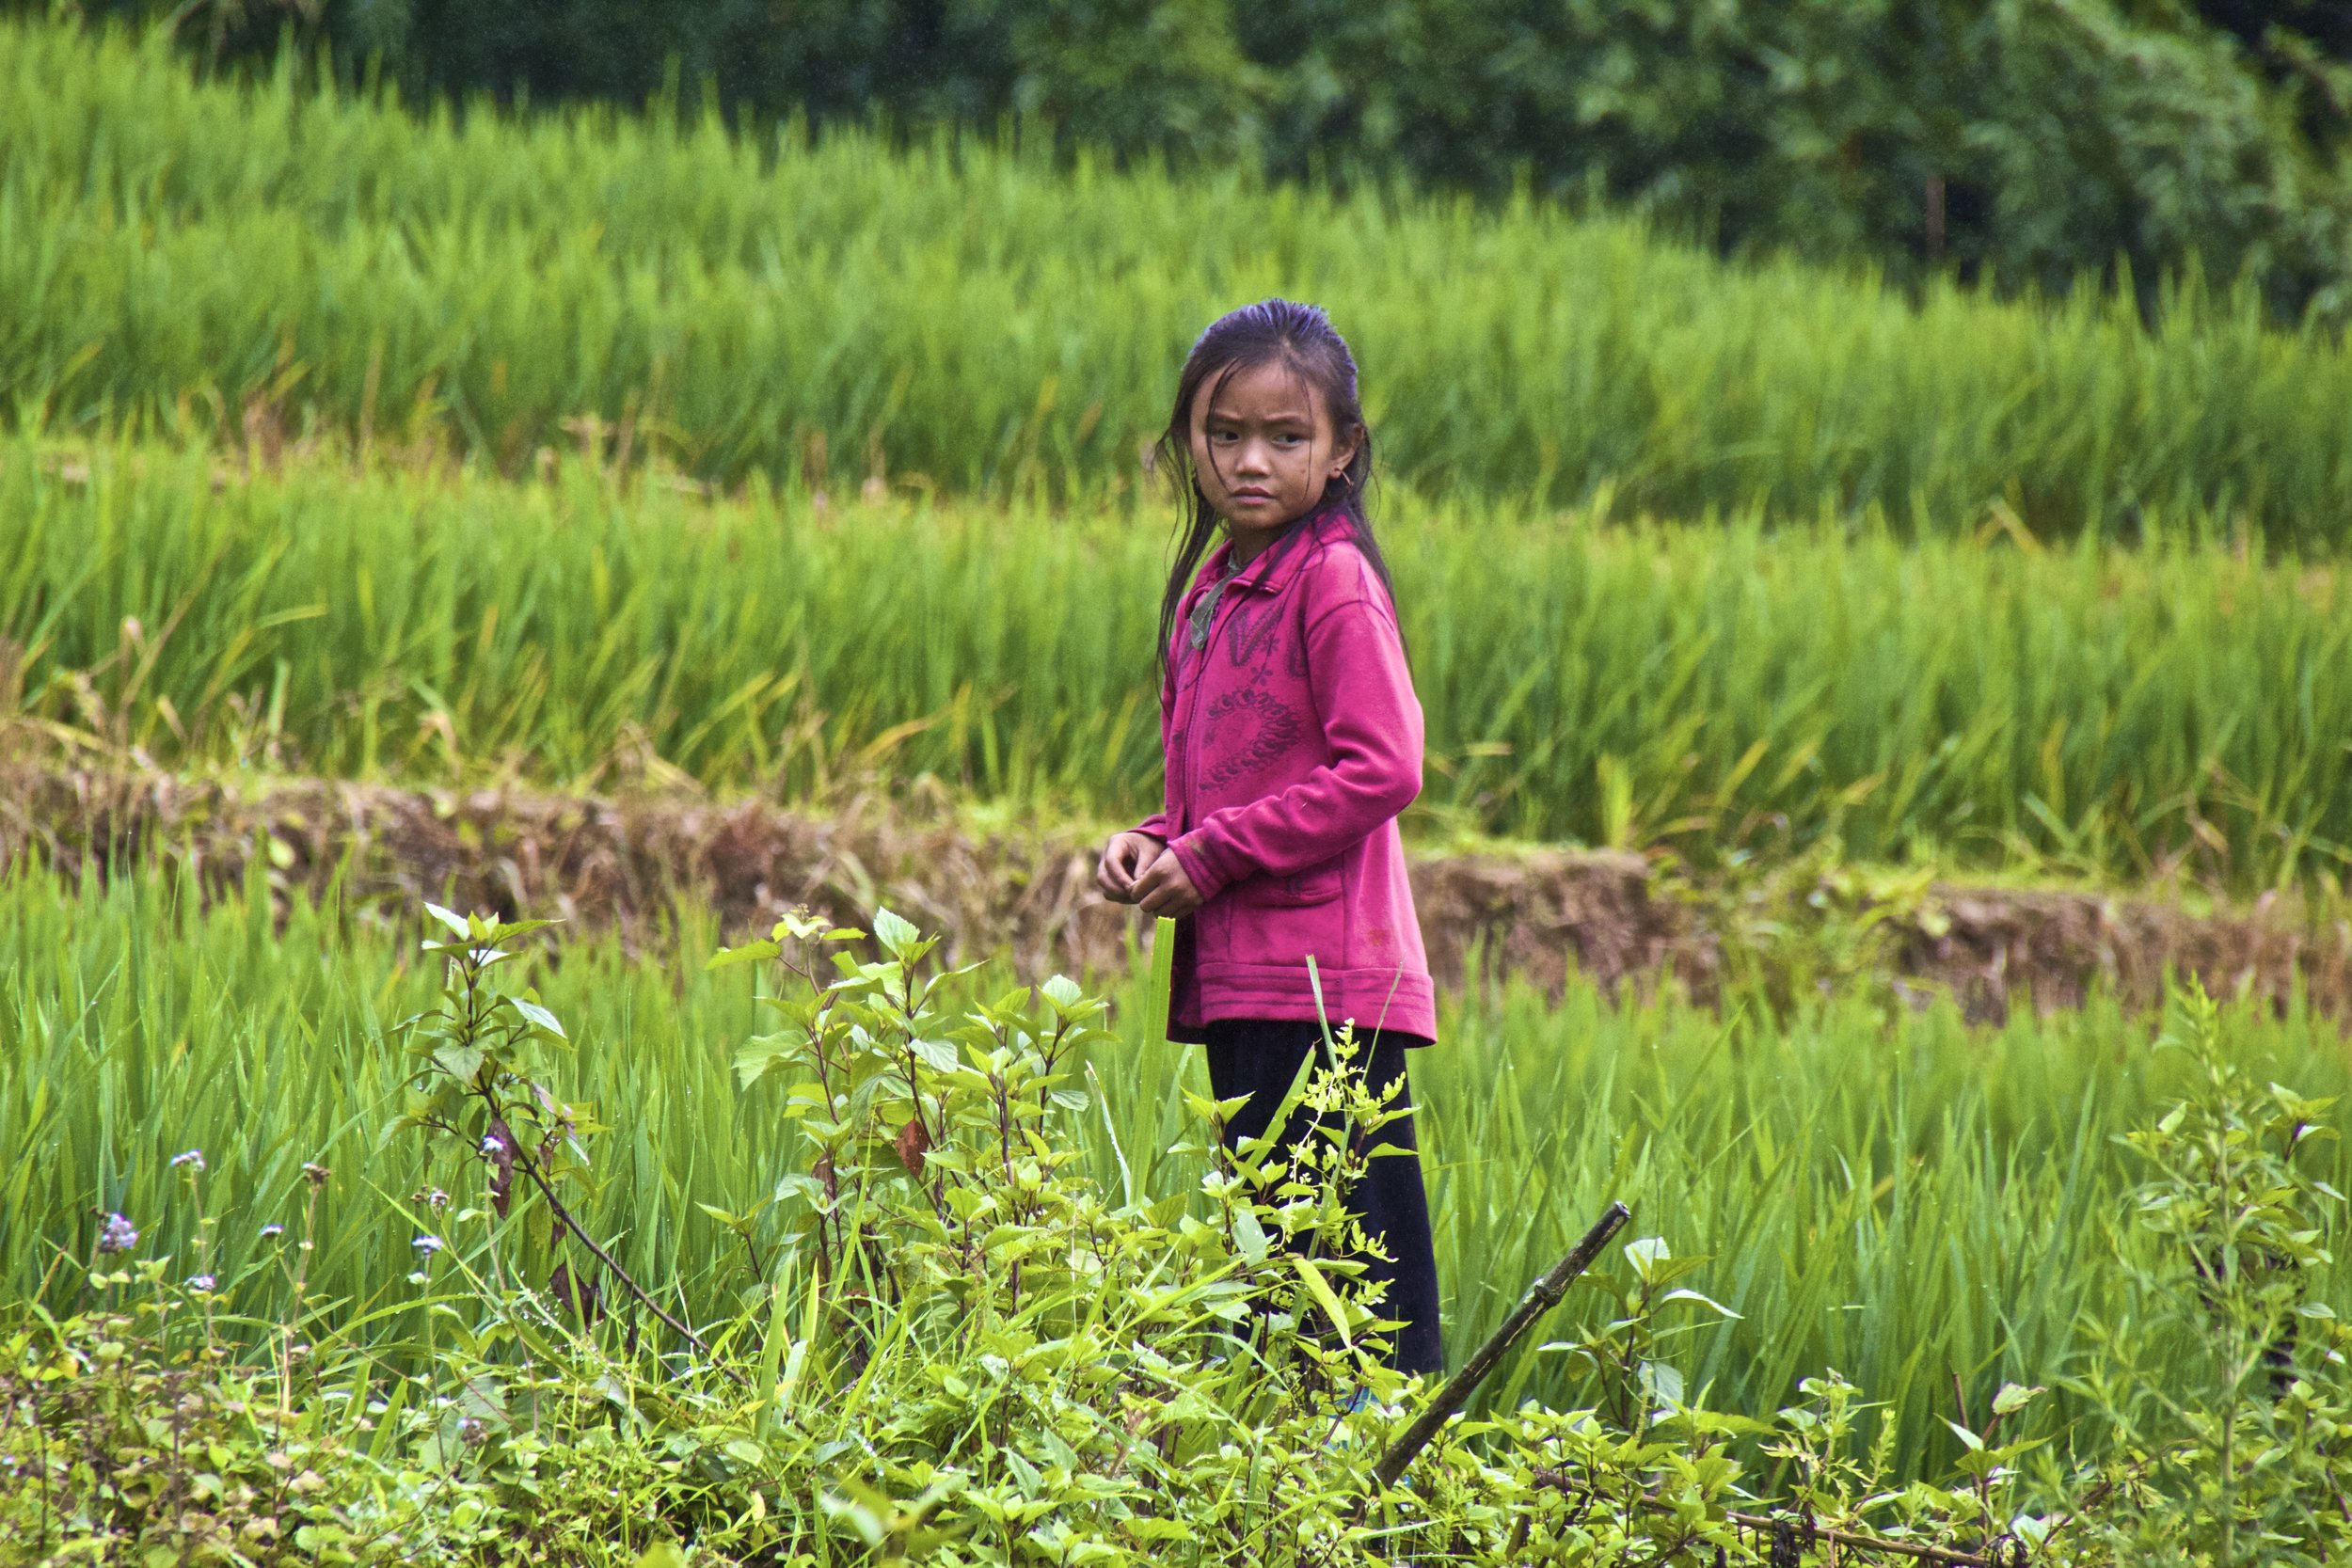 sa pa hmong people rice paddies 2.jpg